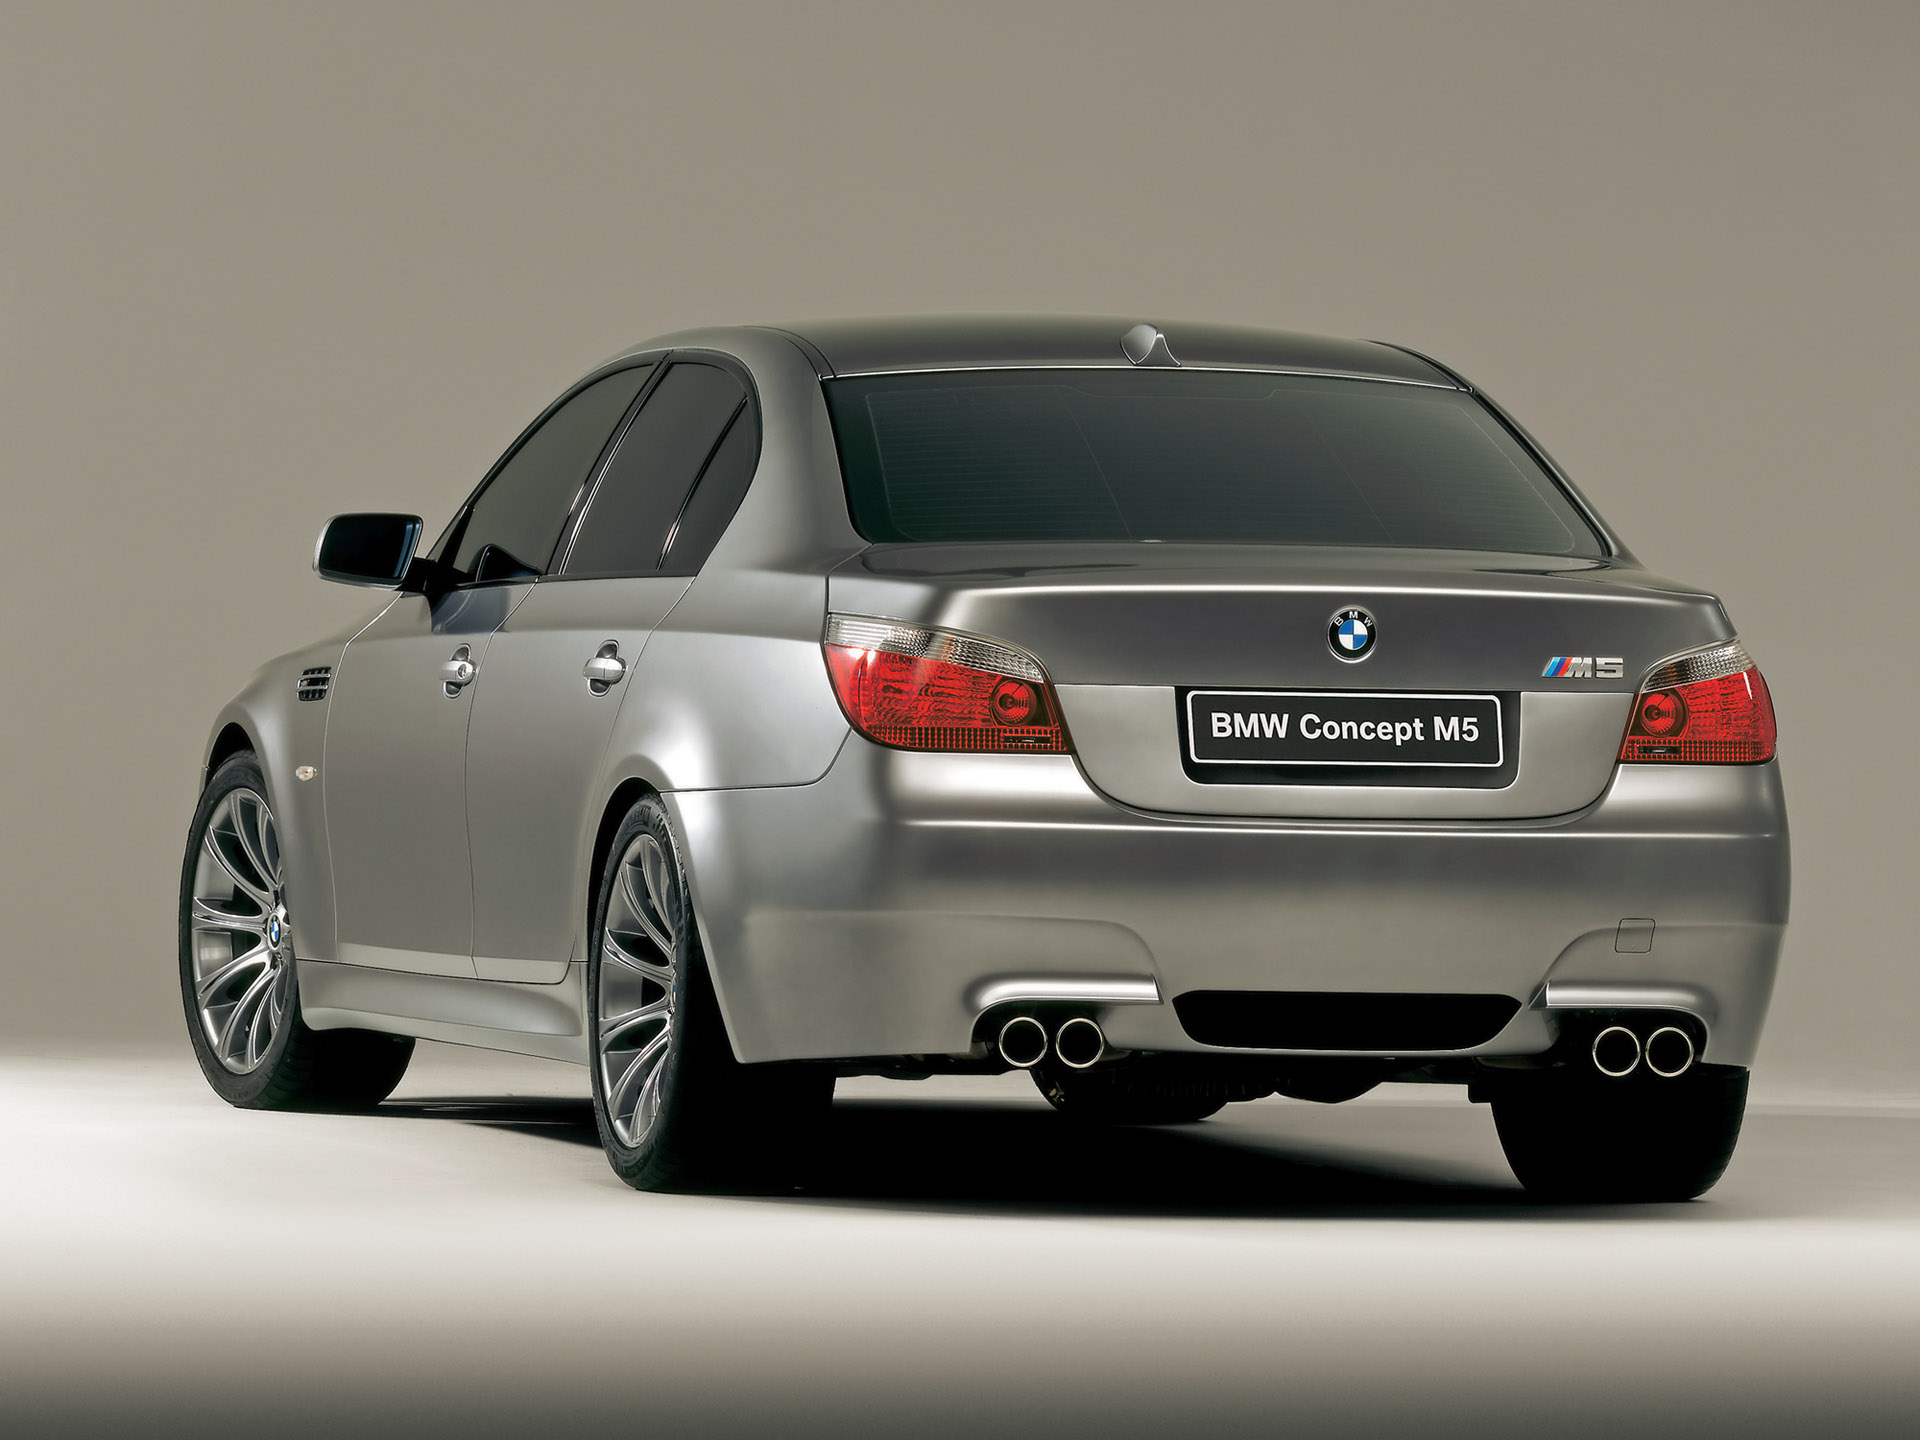 2004 BMW M5 Image. https://www.conceptcarz.com/images/BMW/2004-BMW ...